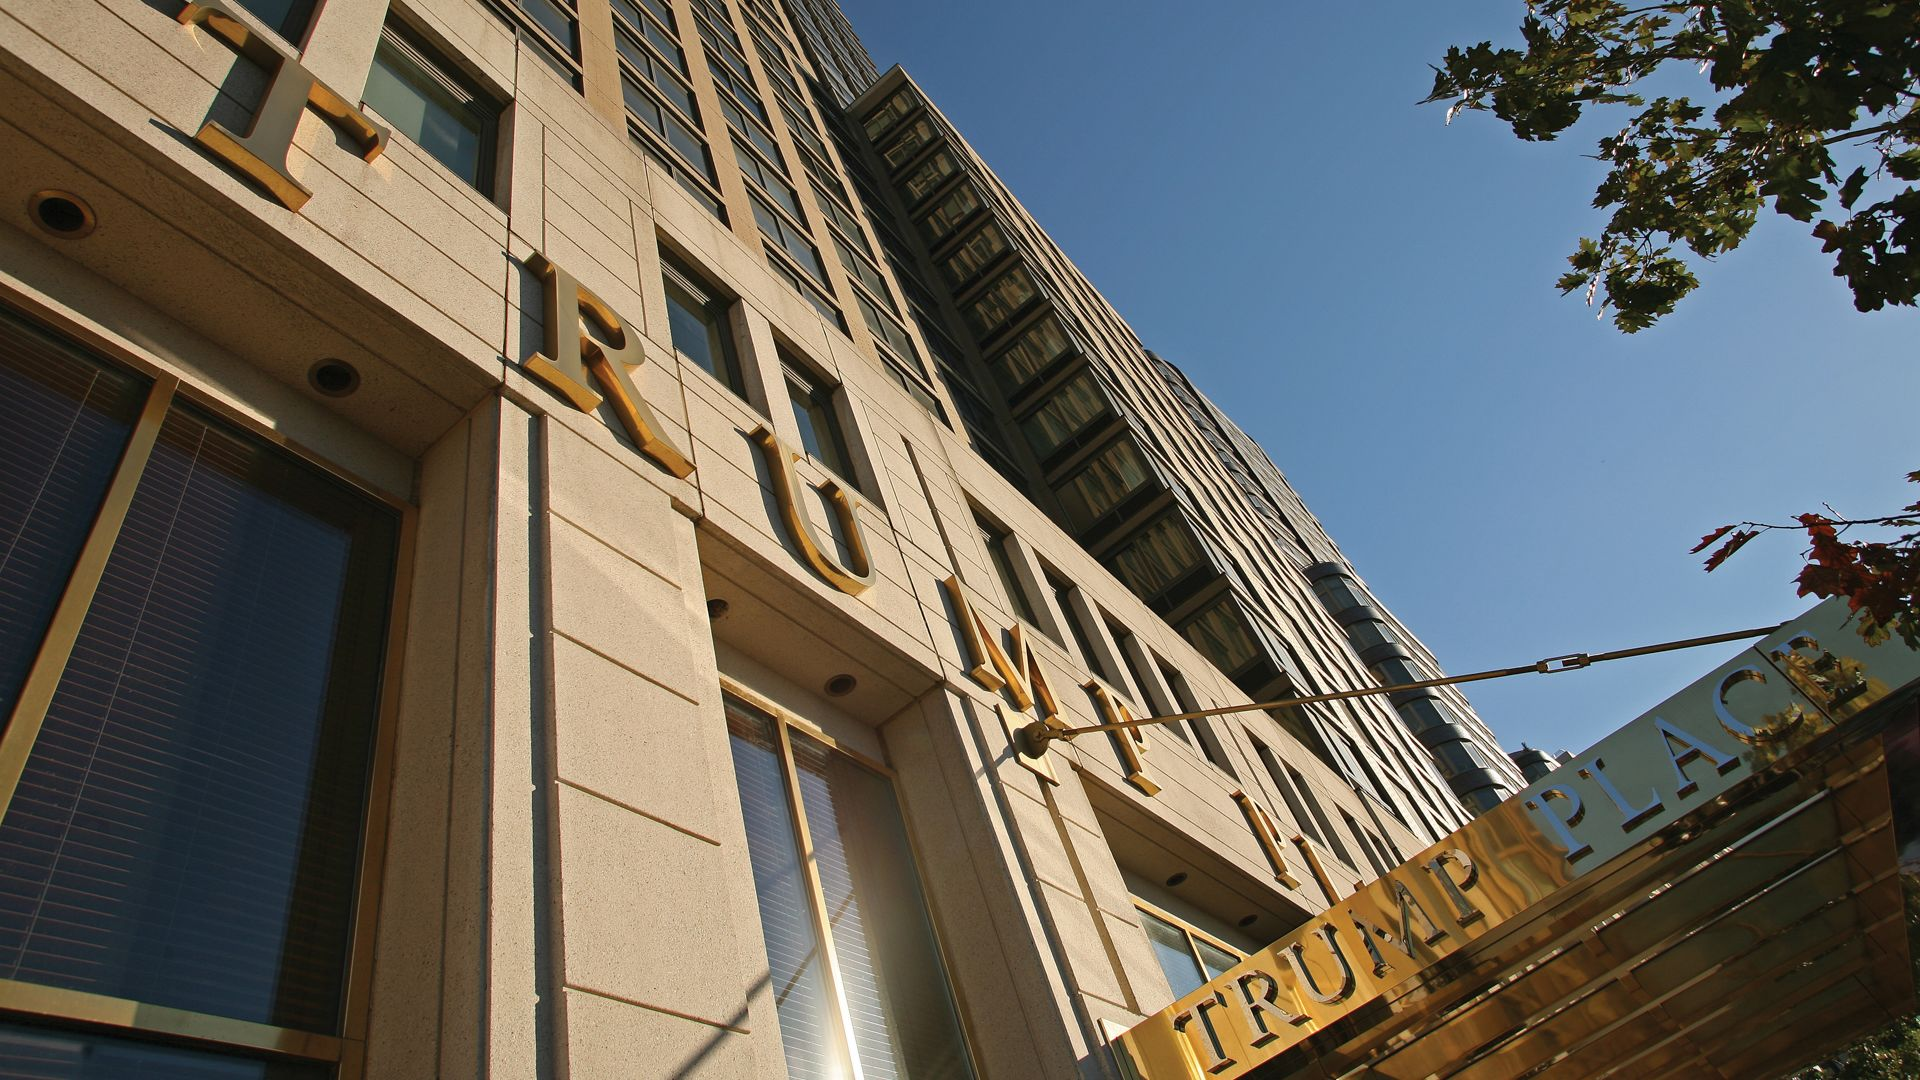 Trump Place 160 Riverside Blvd Apartments - Exterior